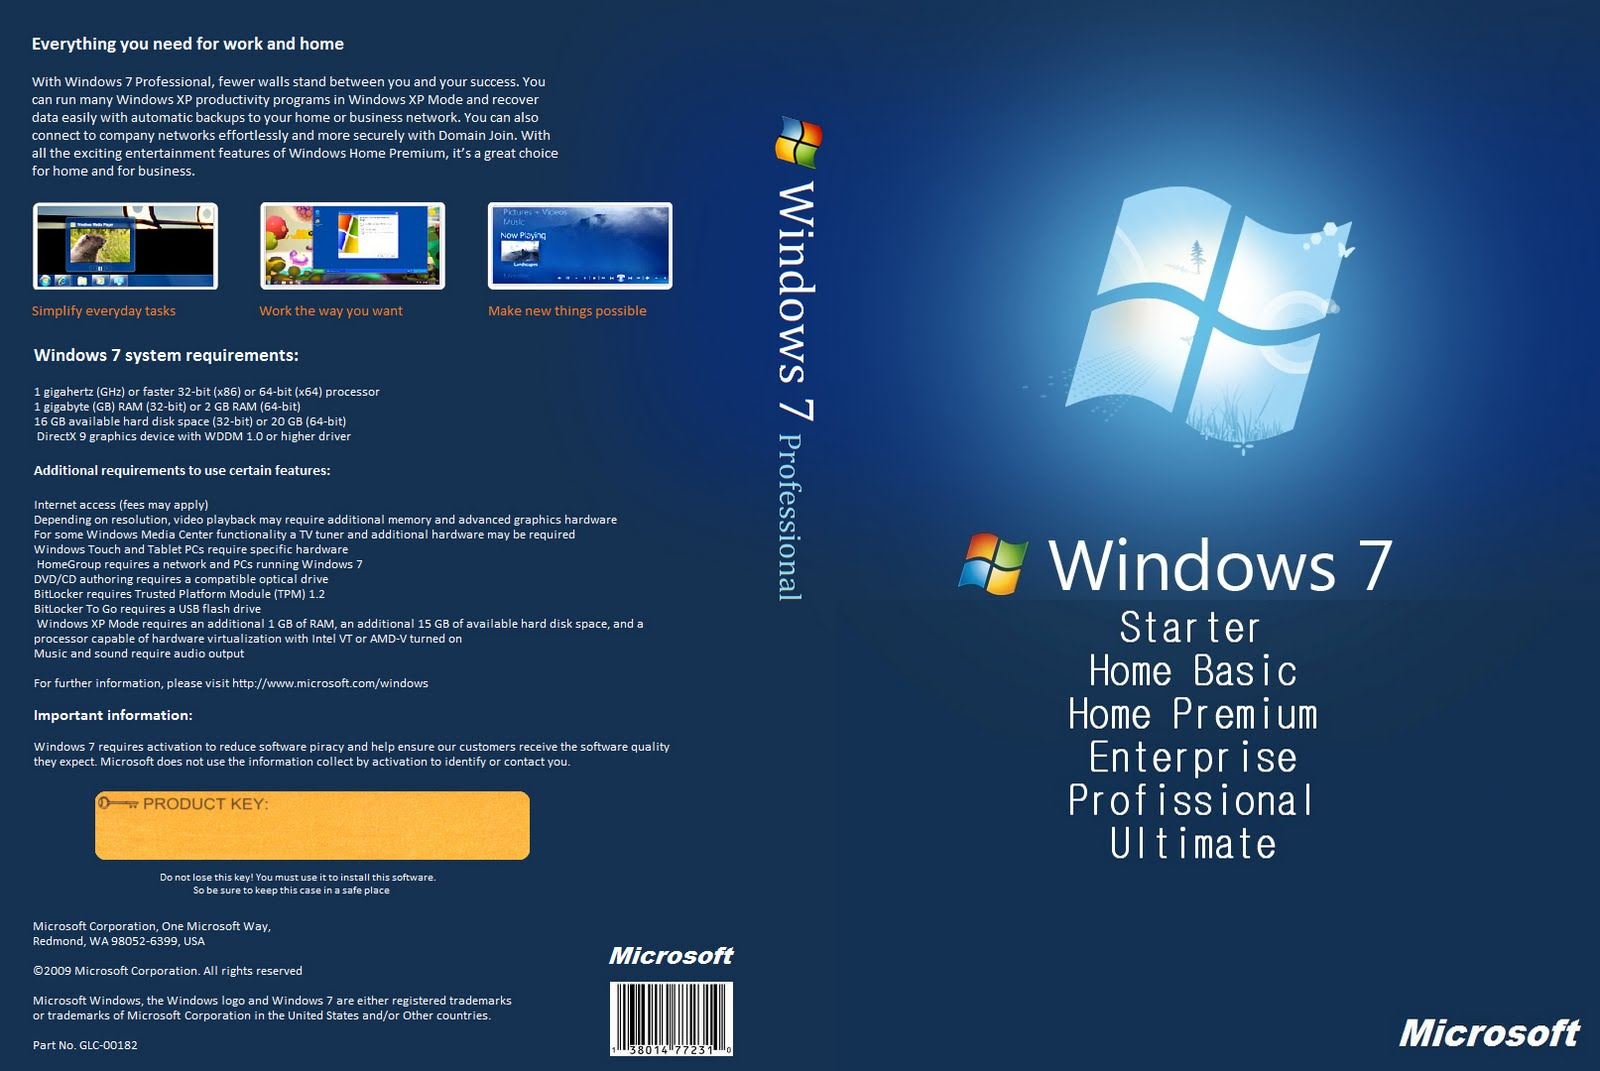 windows 7 todas as verses x86 x64 pt-br sp1